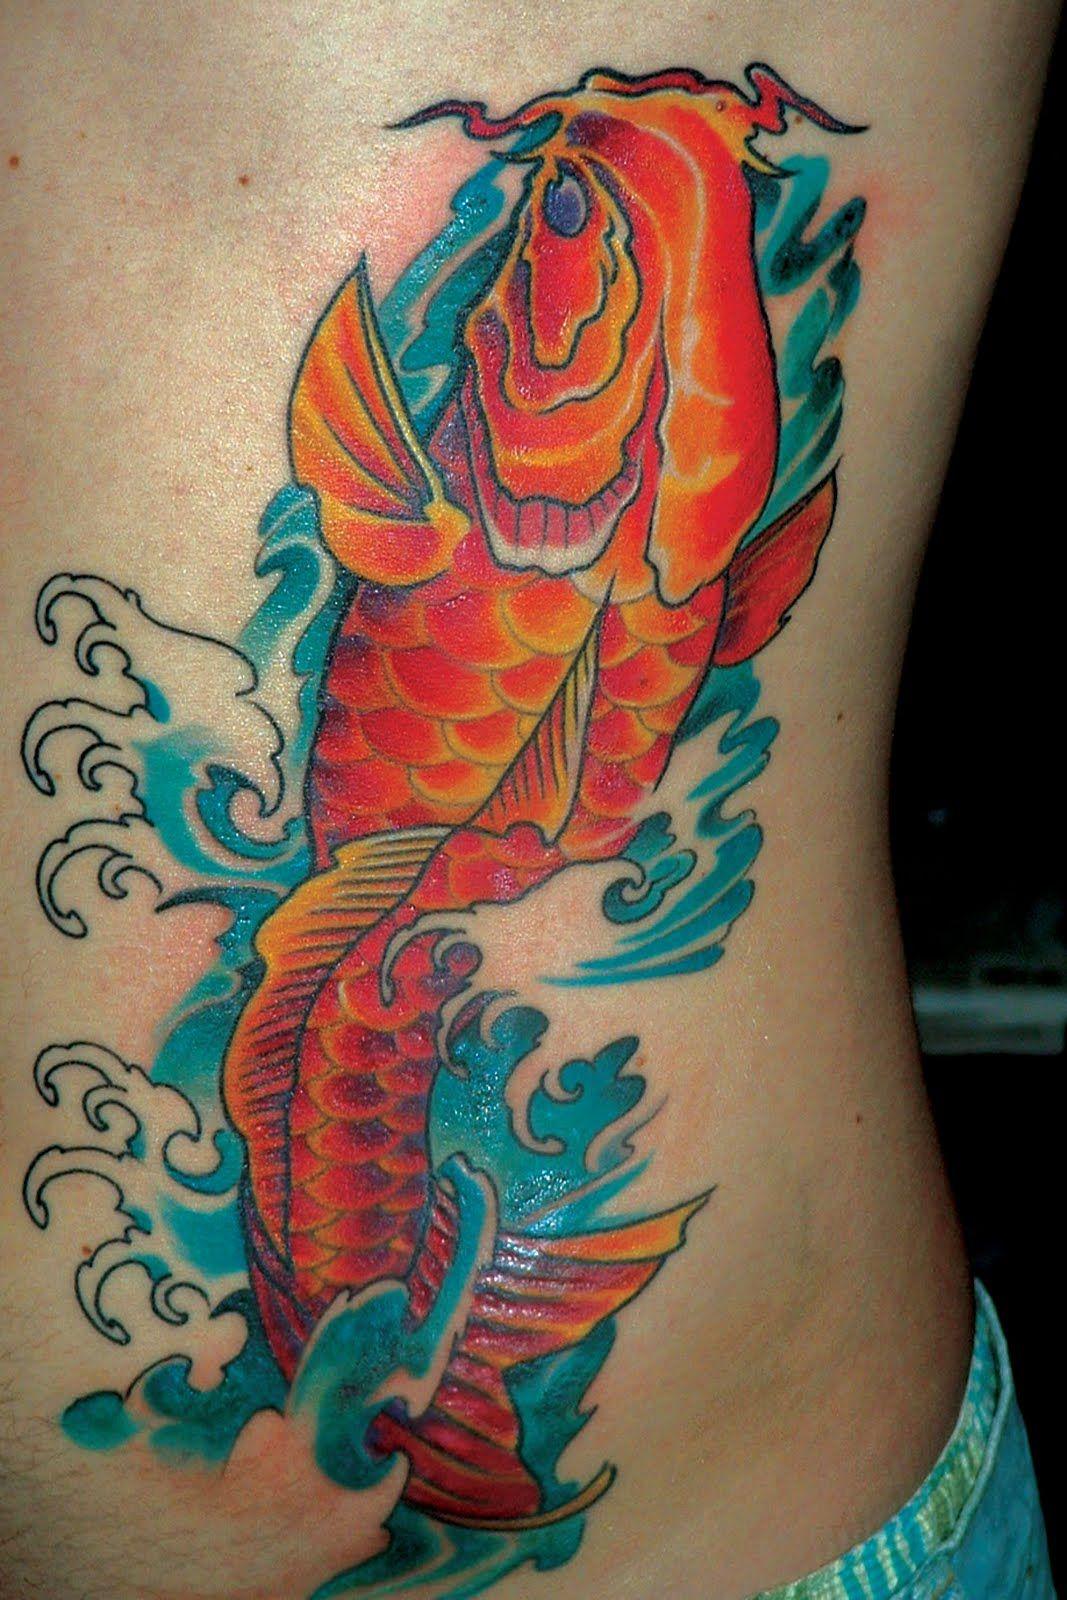 koi fish tattoo forearm - Google Search | For my next tattoo ...